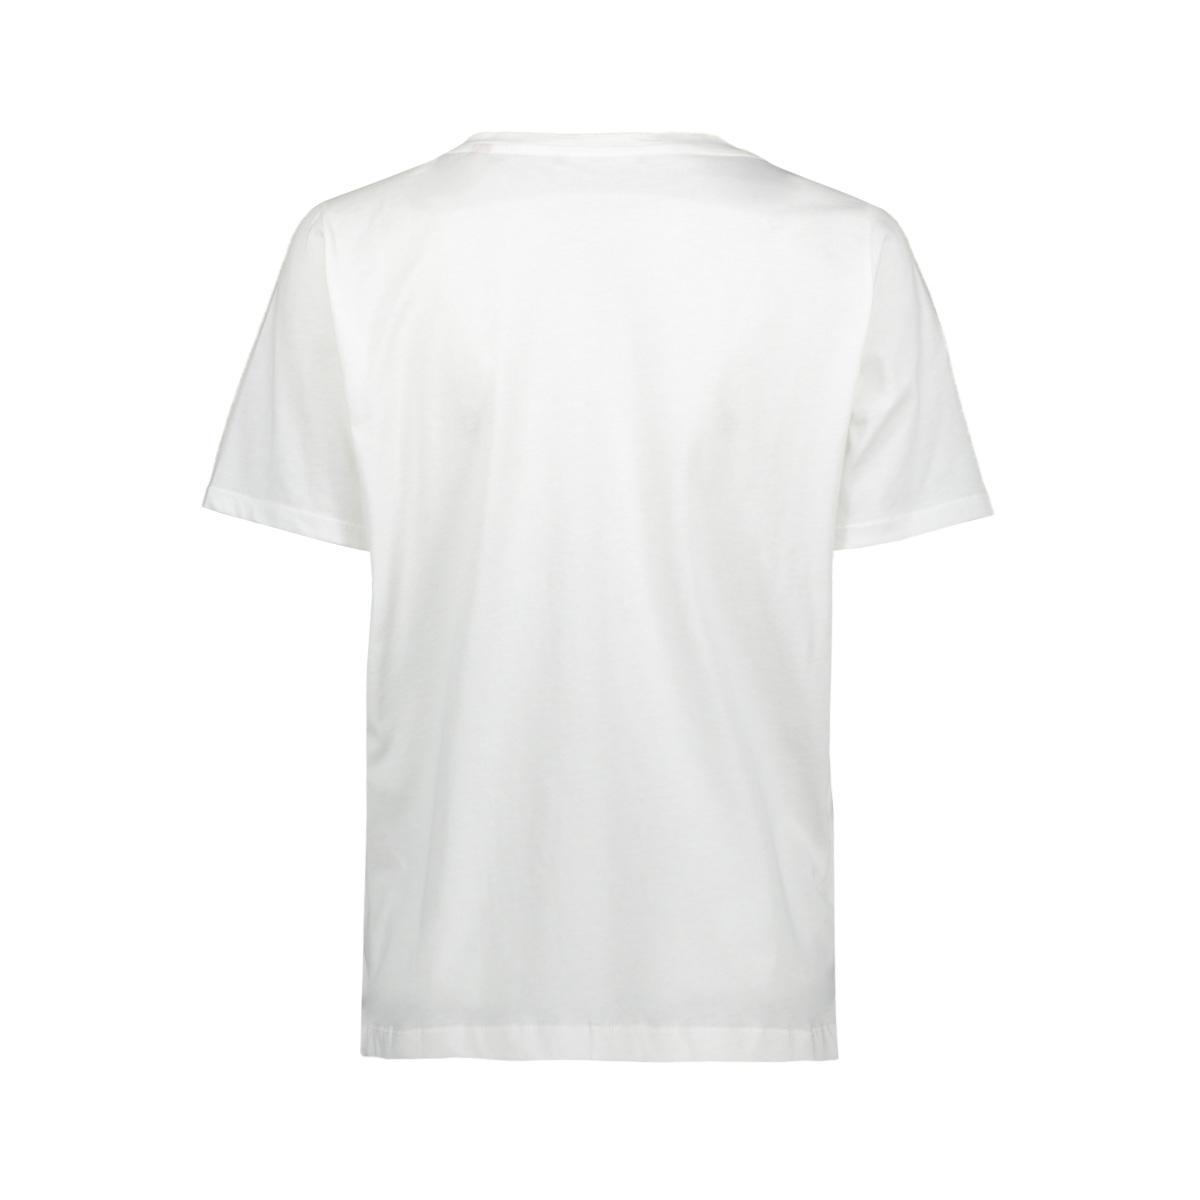 t shirt met modieuze print op voorkant 21004326470 s.oliver t-shirt 02d0